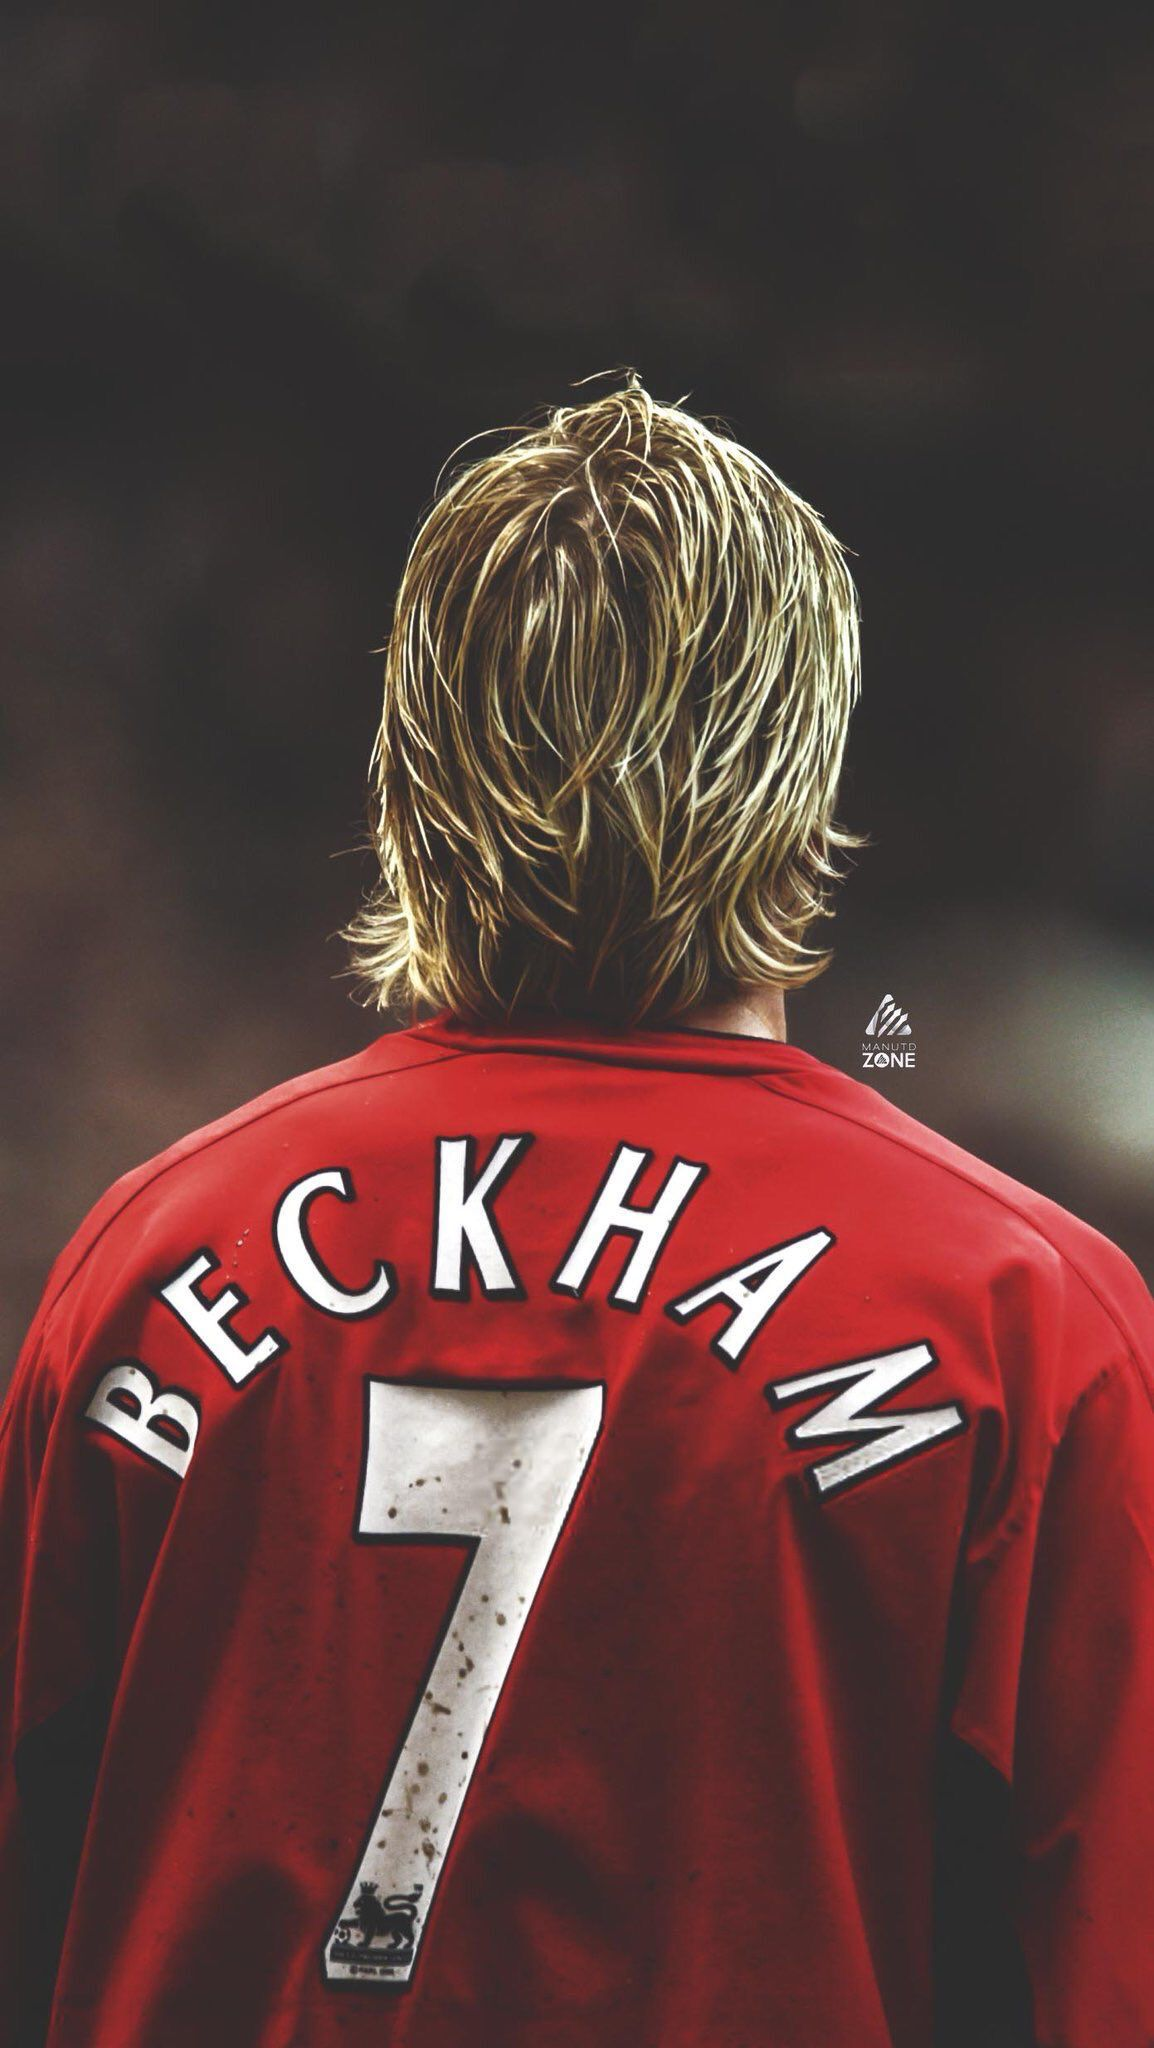 David Beckham Phone Wallpaper In 2020 David Beckham Soccer David Beckham Football David Beckham Manchester United